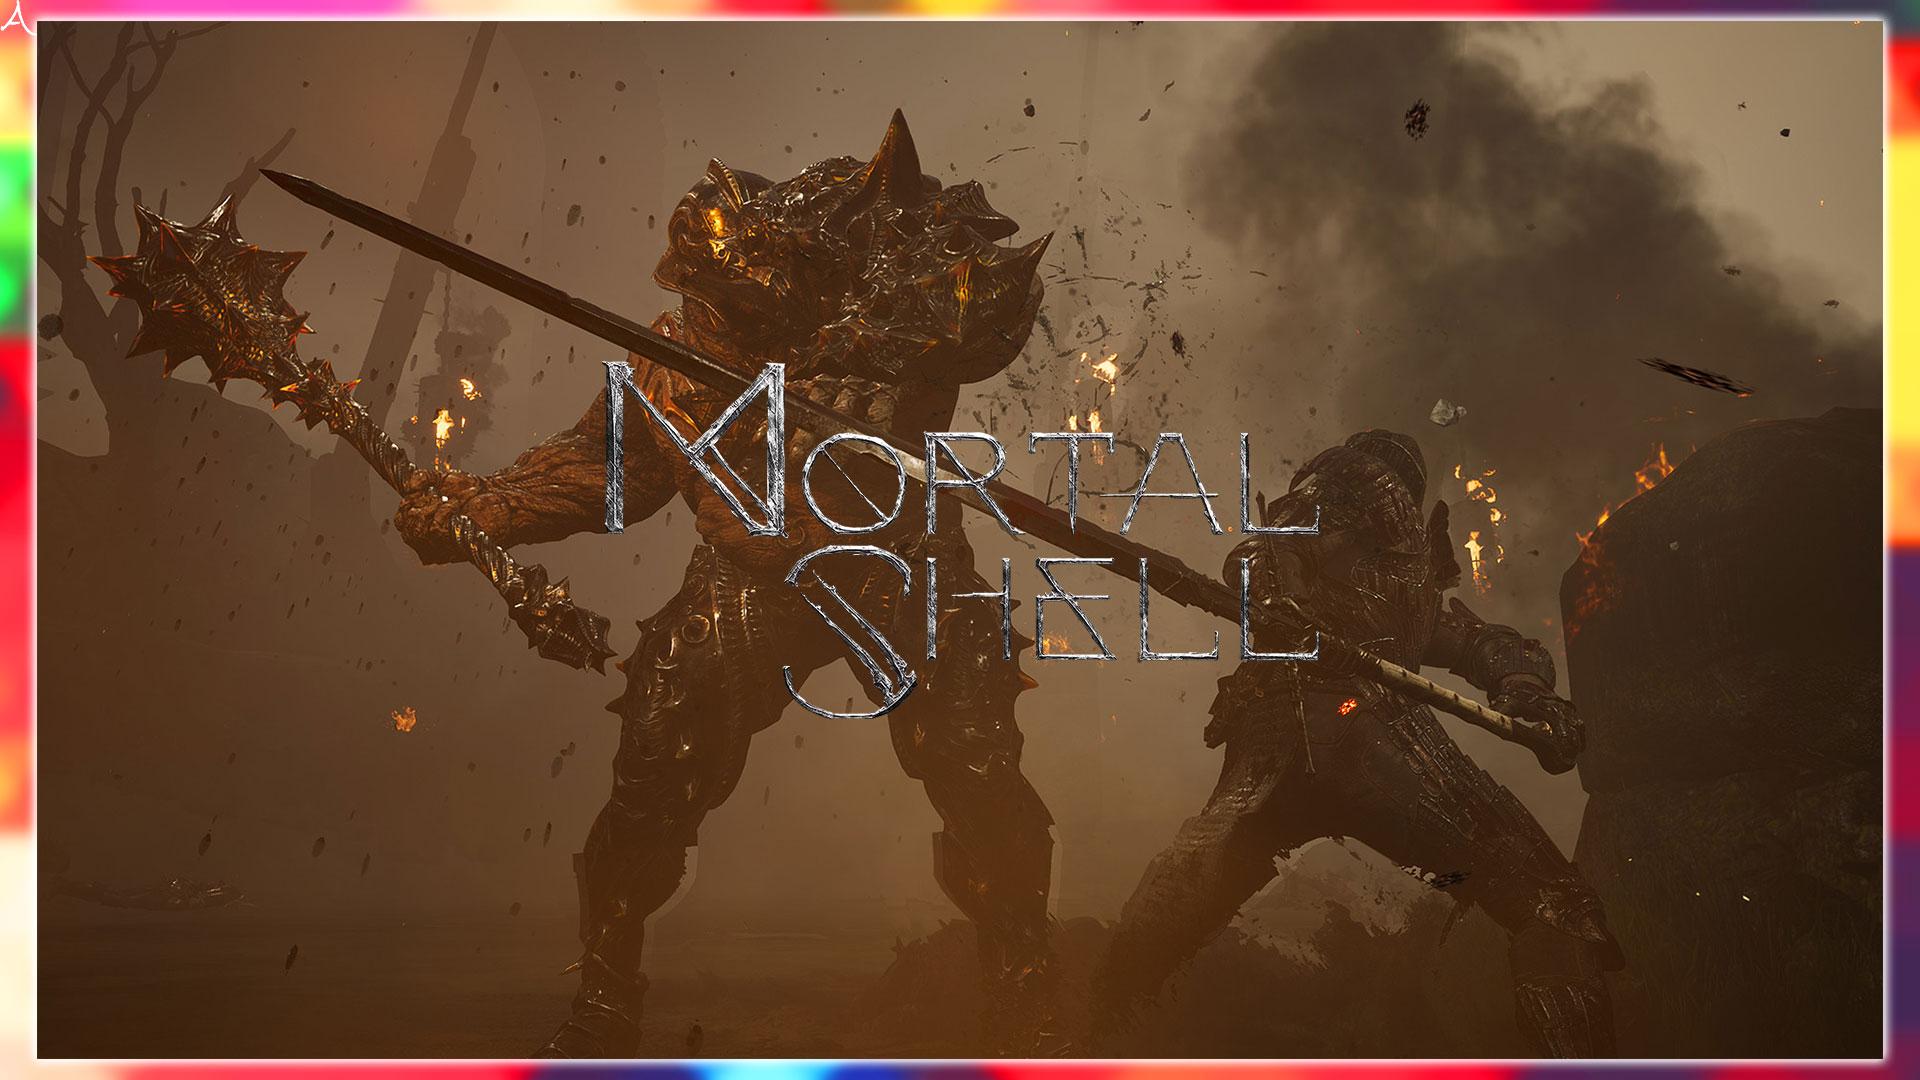 PC版「Mortal Shell」に必要な最低/推奨スペックを確認:快適プレイに必要な値段はどれくらい?